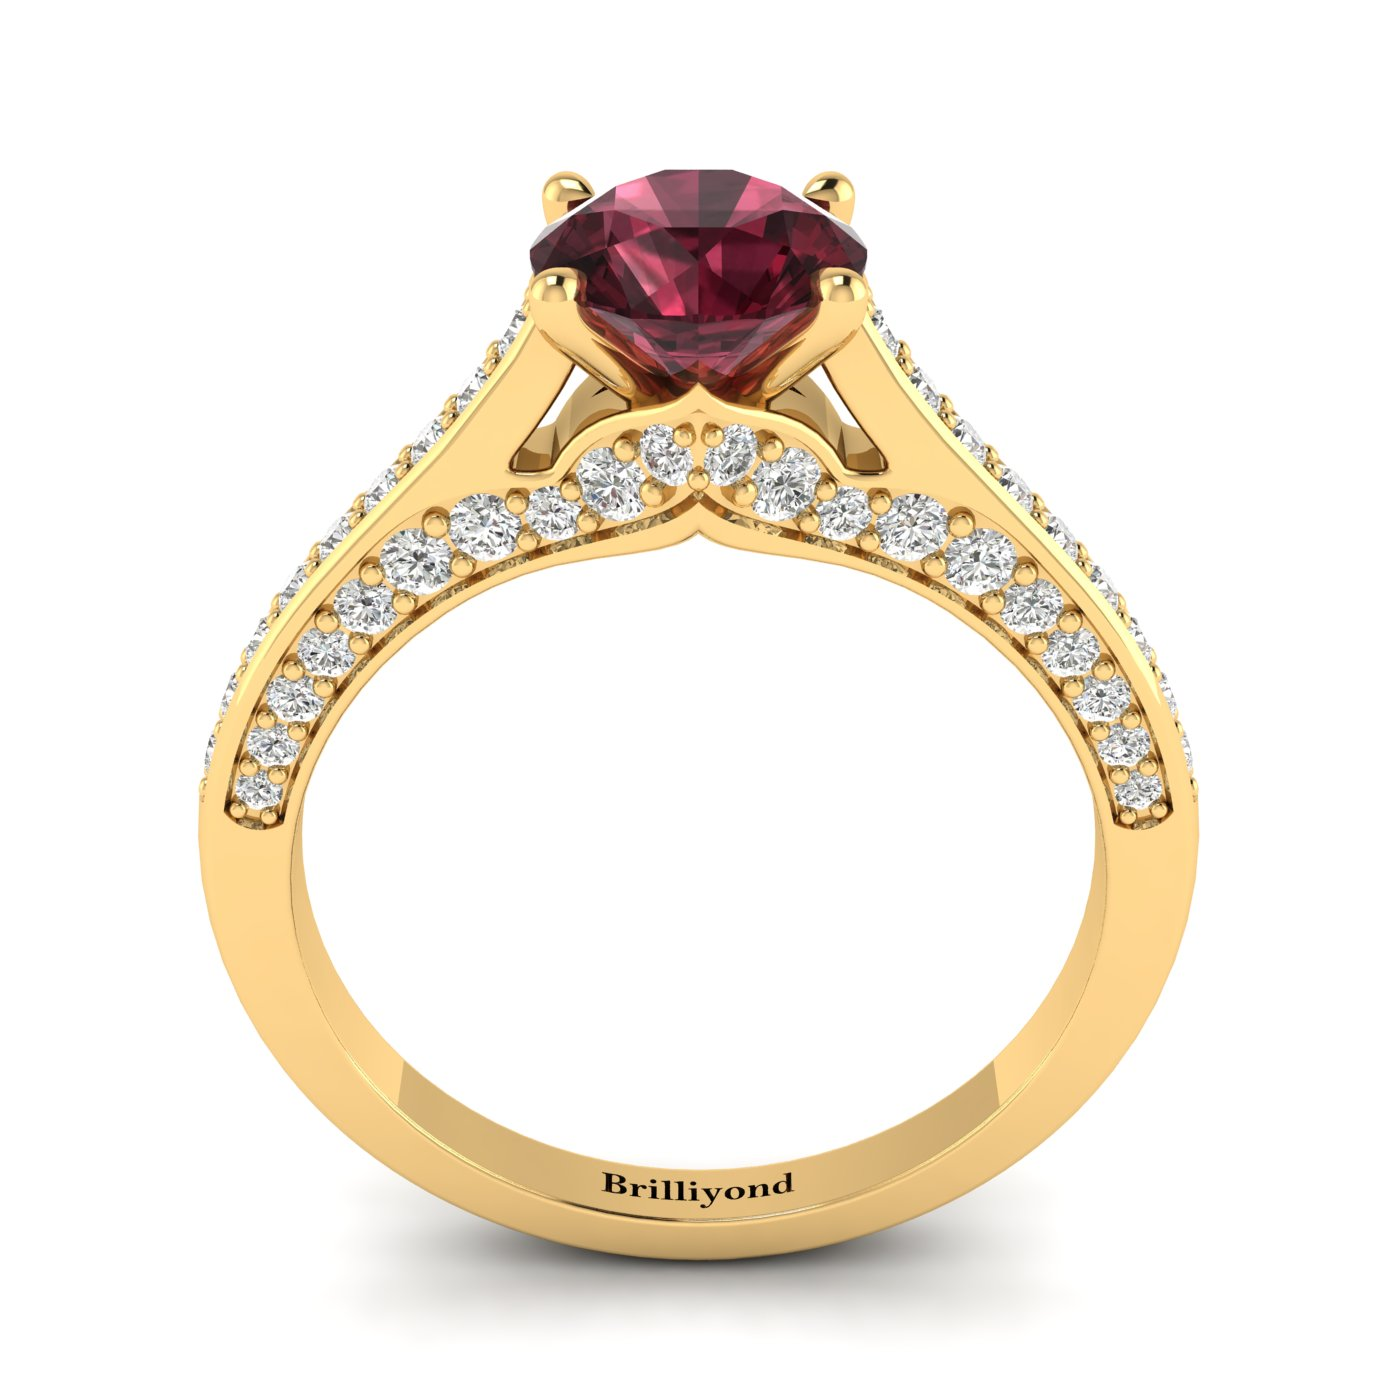 Brilliant Cut Engagement Ring Stargate_image2